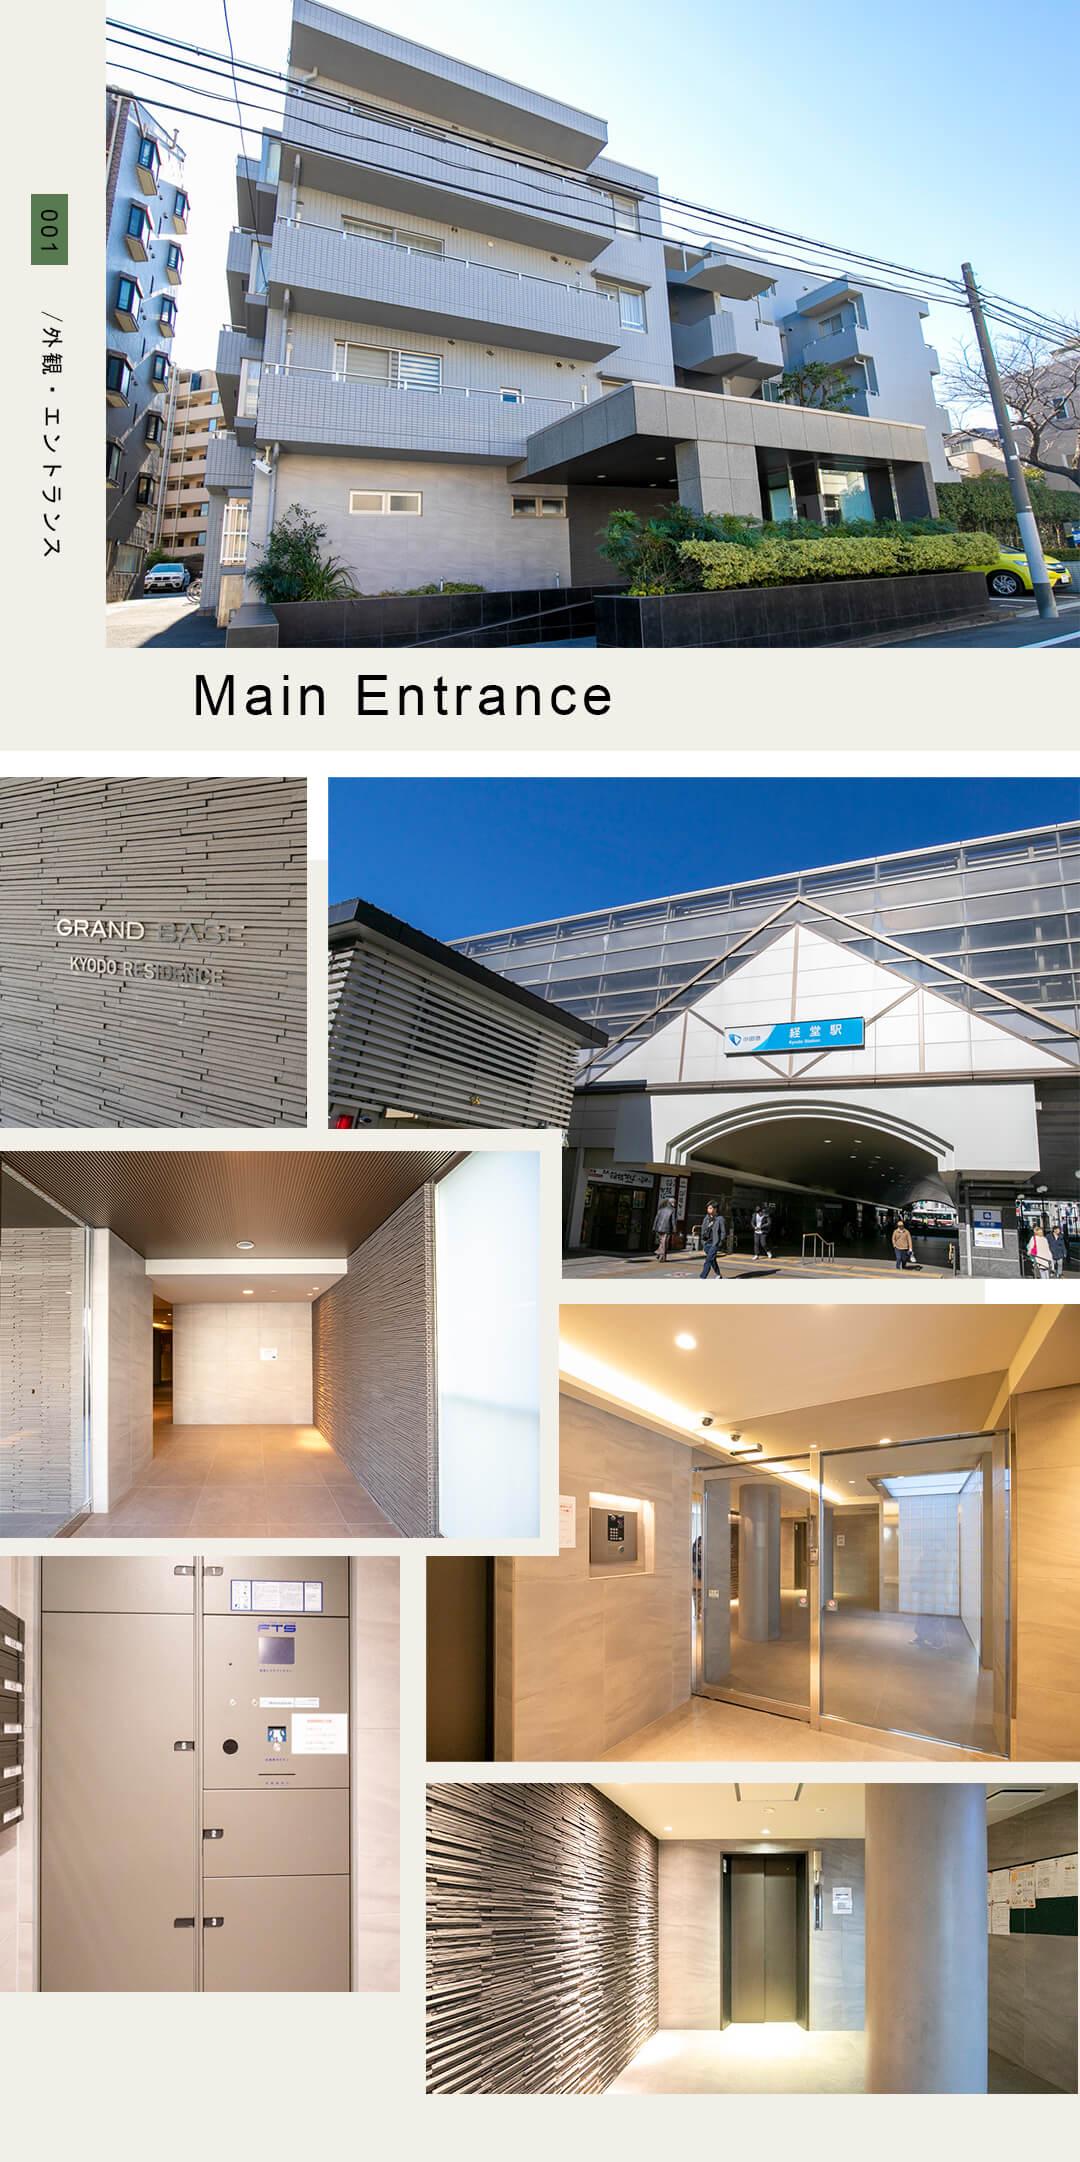 001,Main Entrance.外観,エントランス